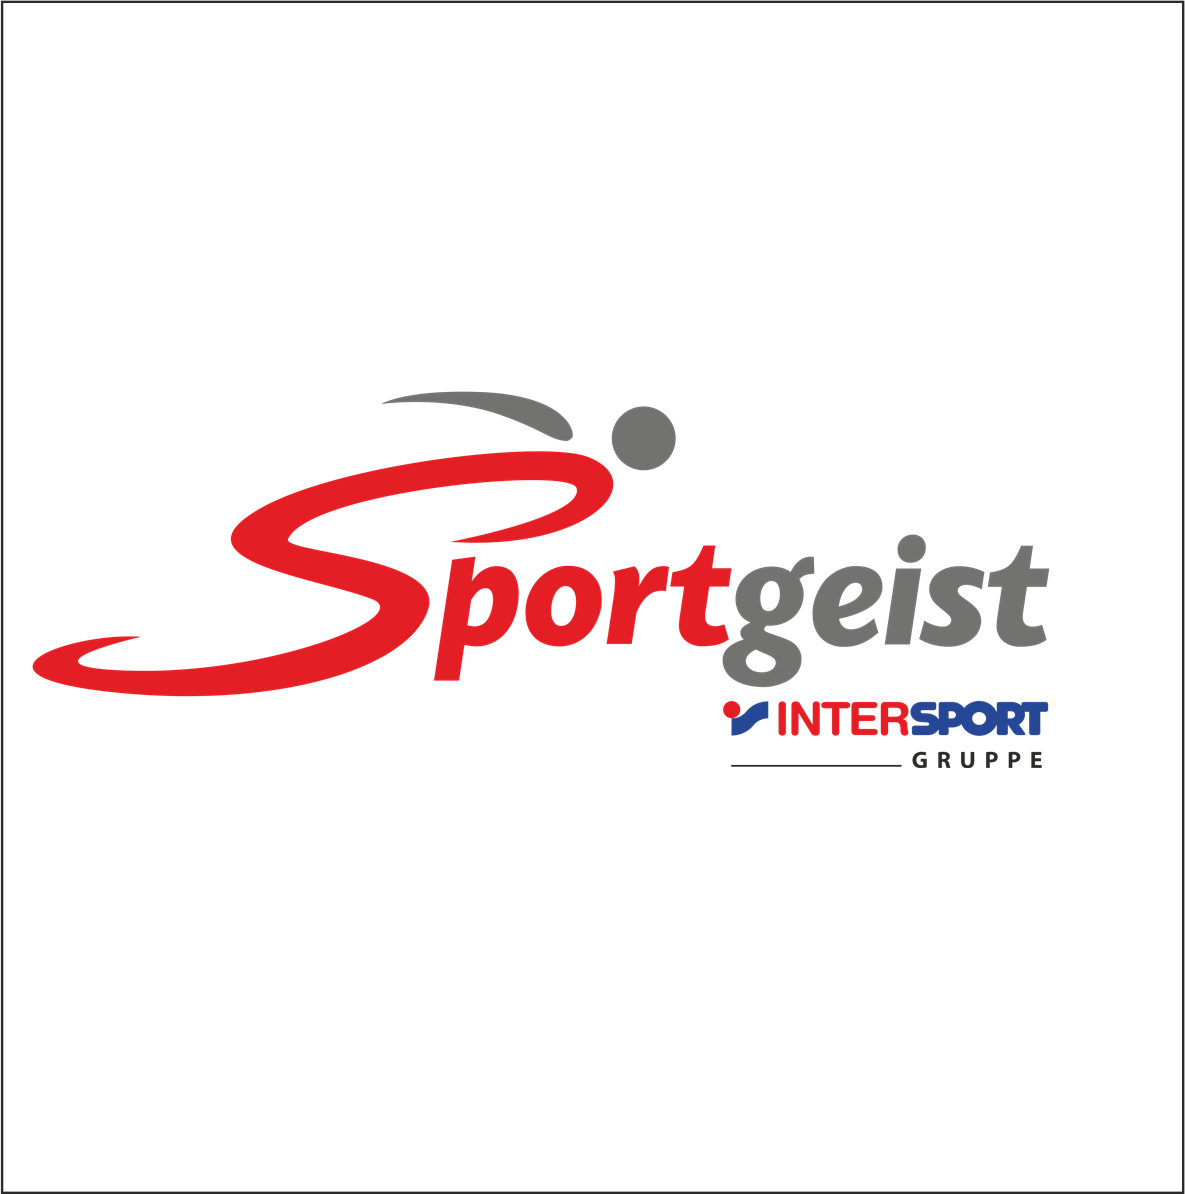 Sportgeist